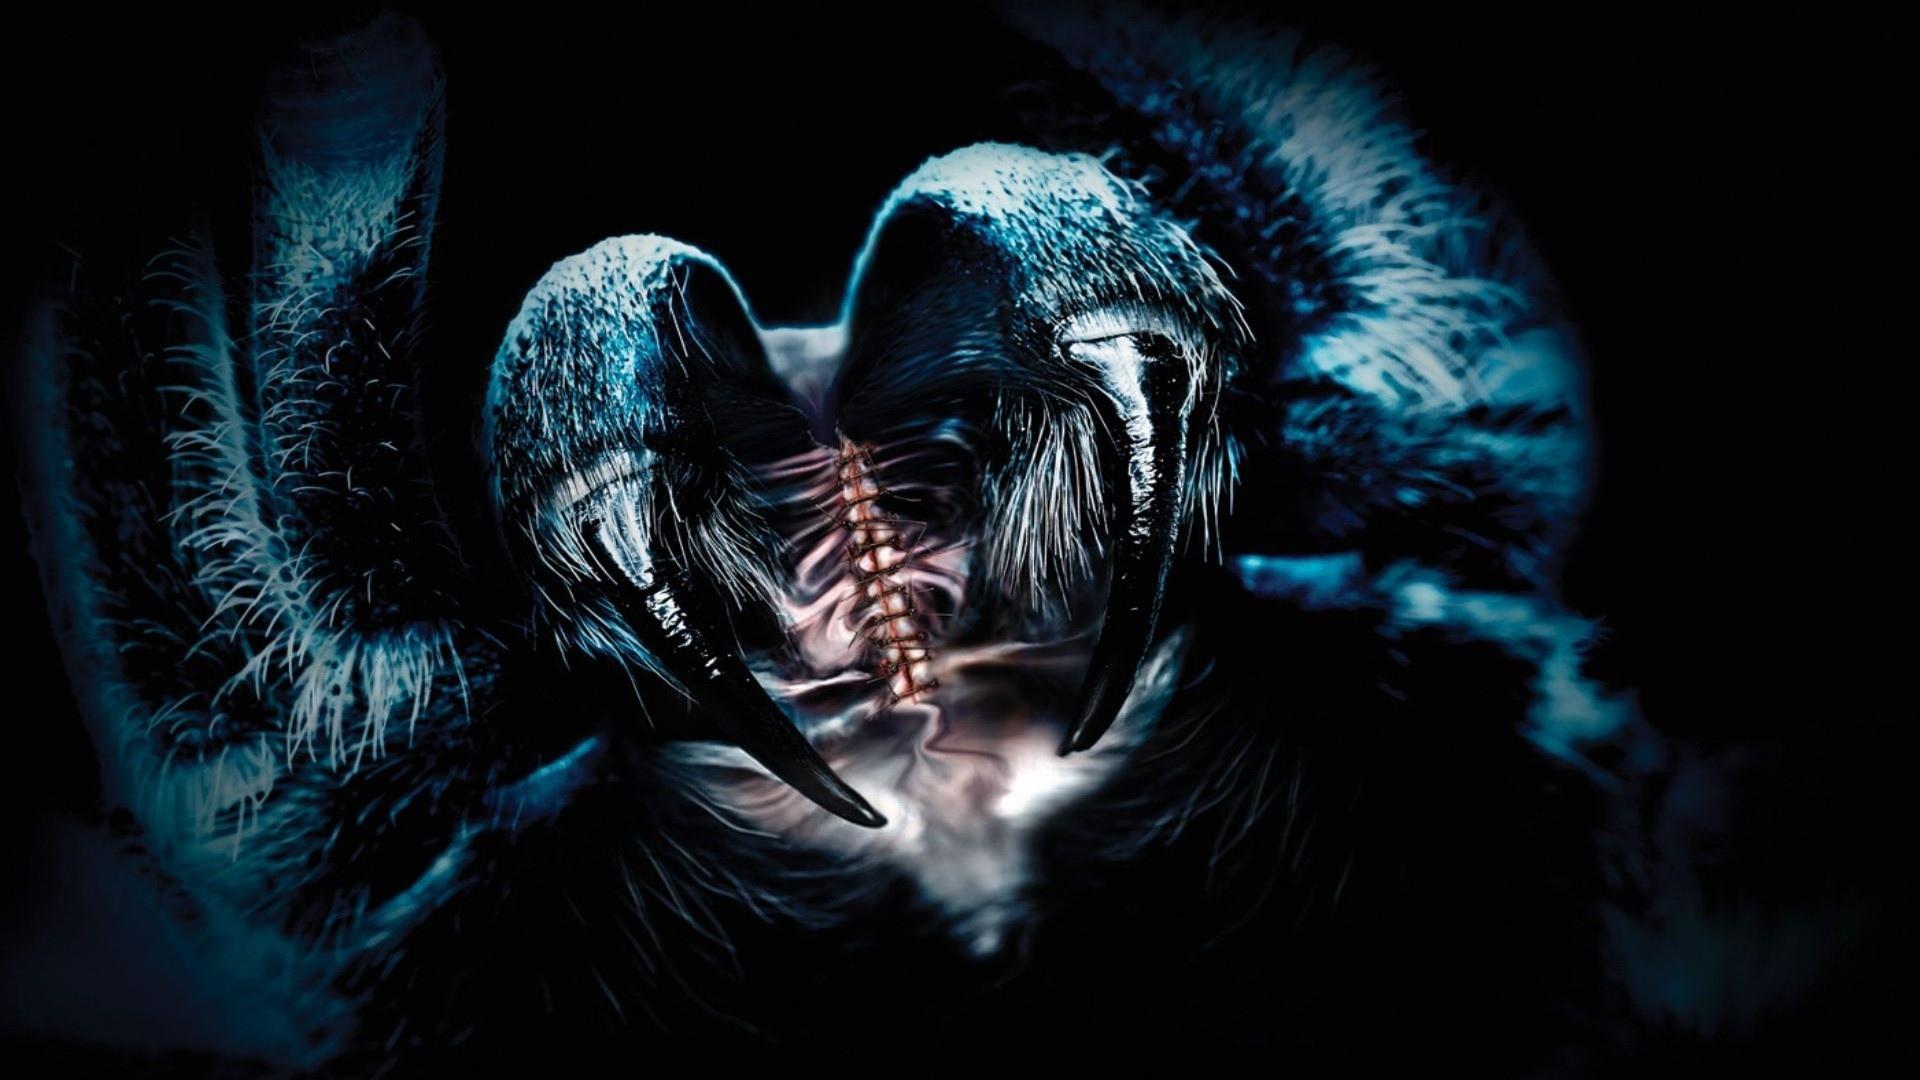 Wallpapers Download Latest Scary Background Free Download: Fantasy Art Digital Spider Dark Horror Wallpaper